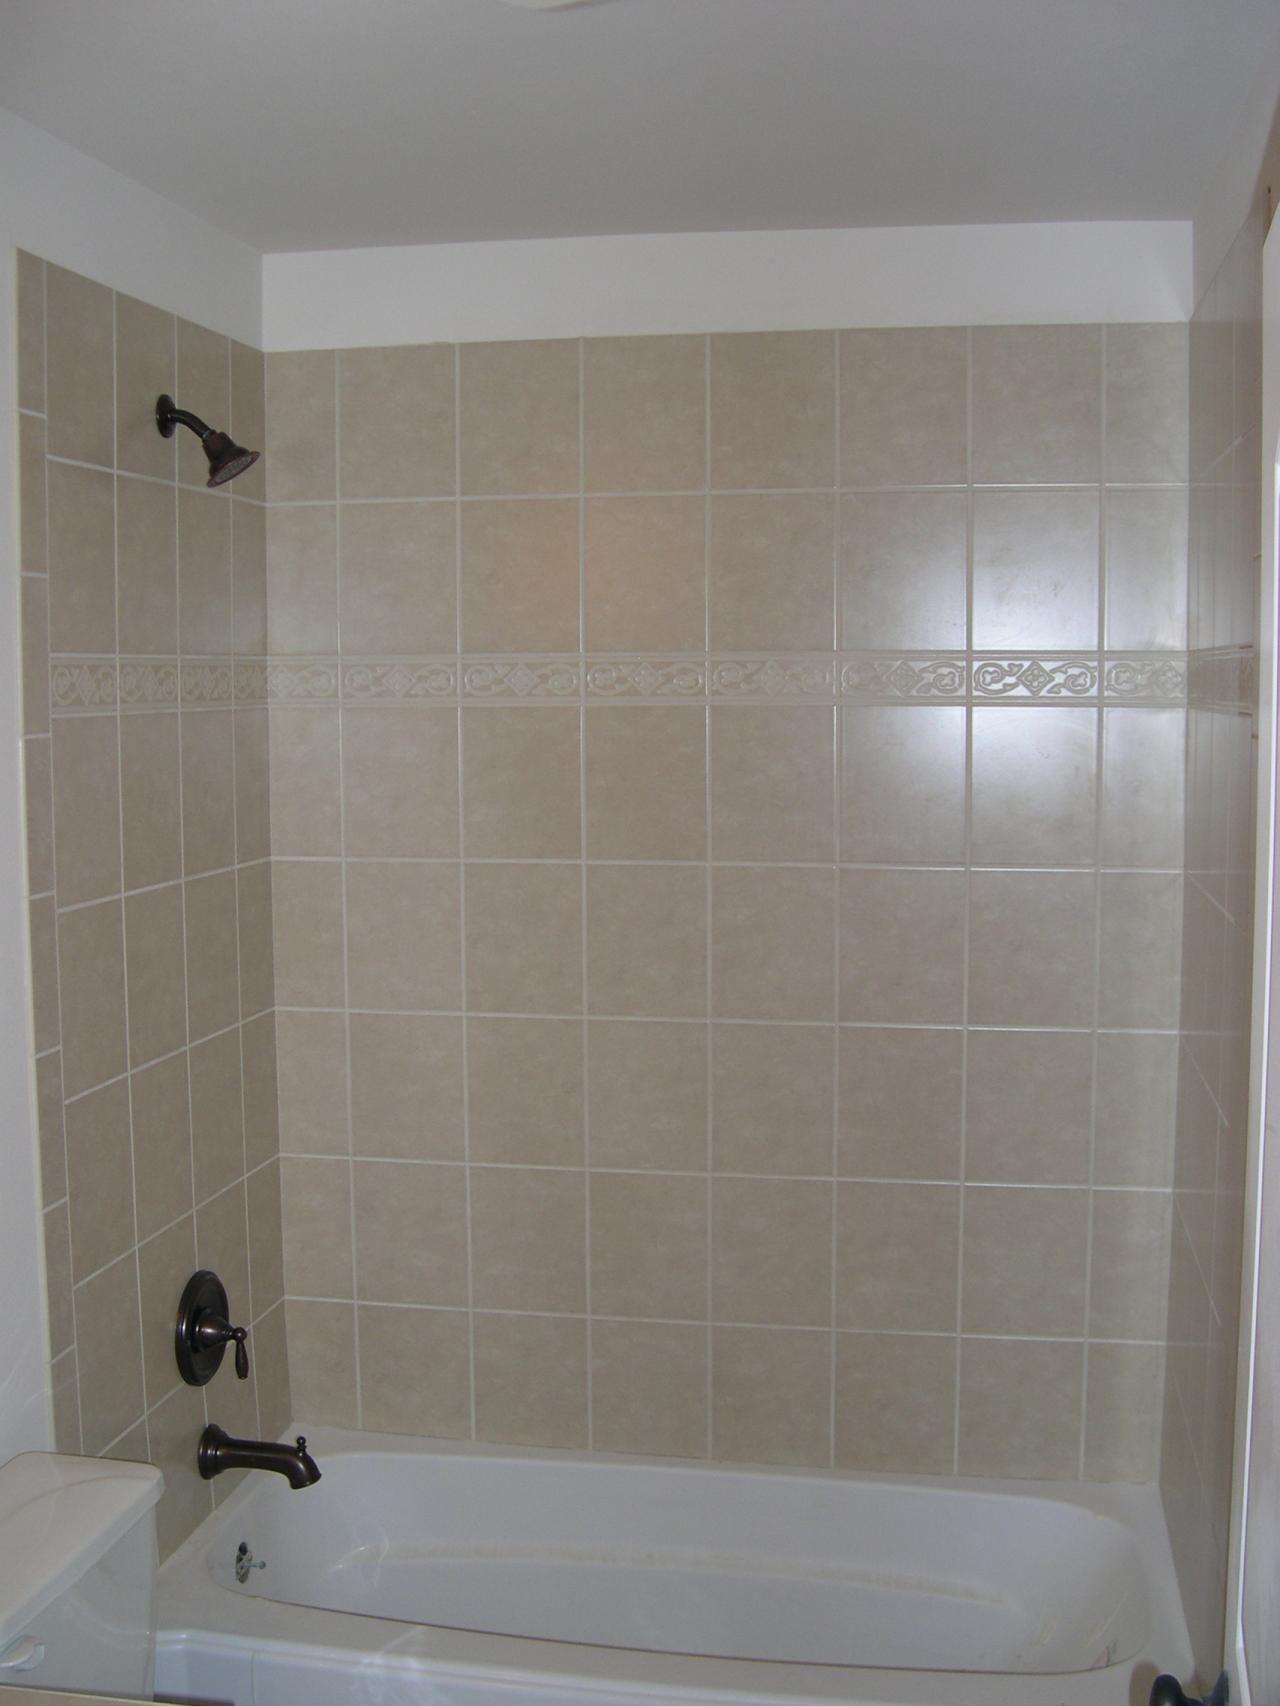 Installing Bathtub Surrounds - http://mesadentiste.com/installing ...